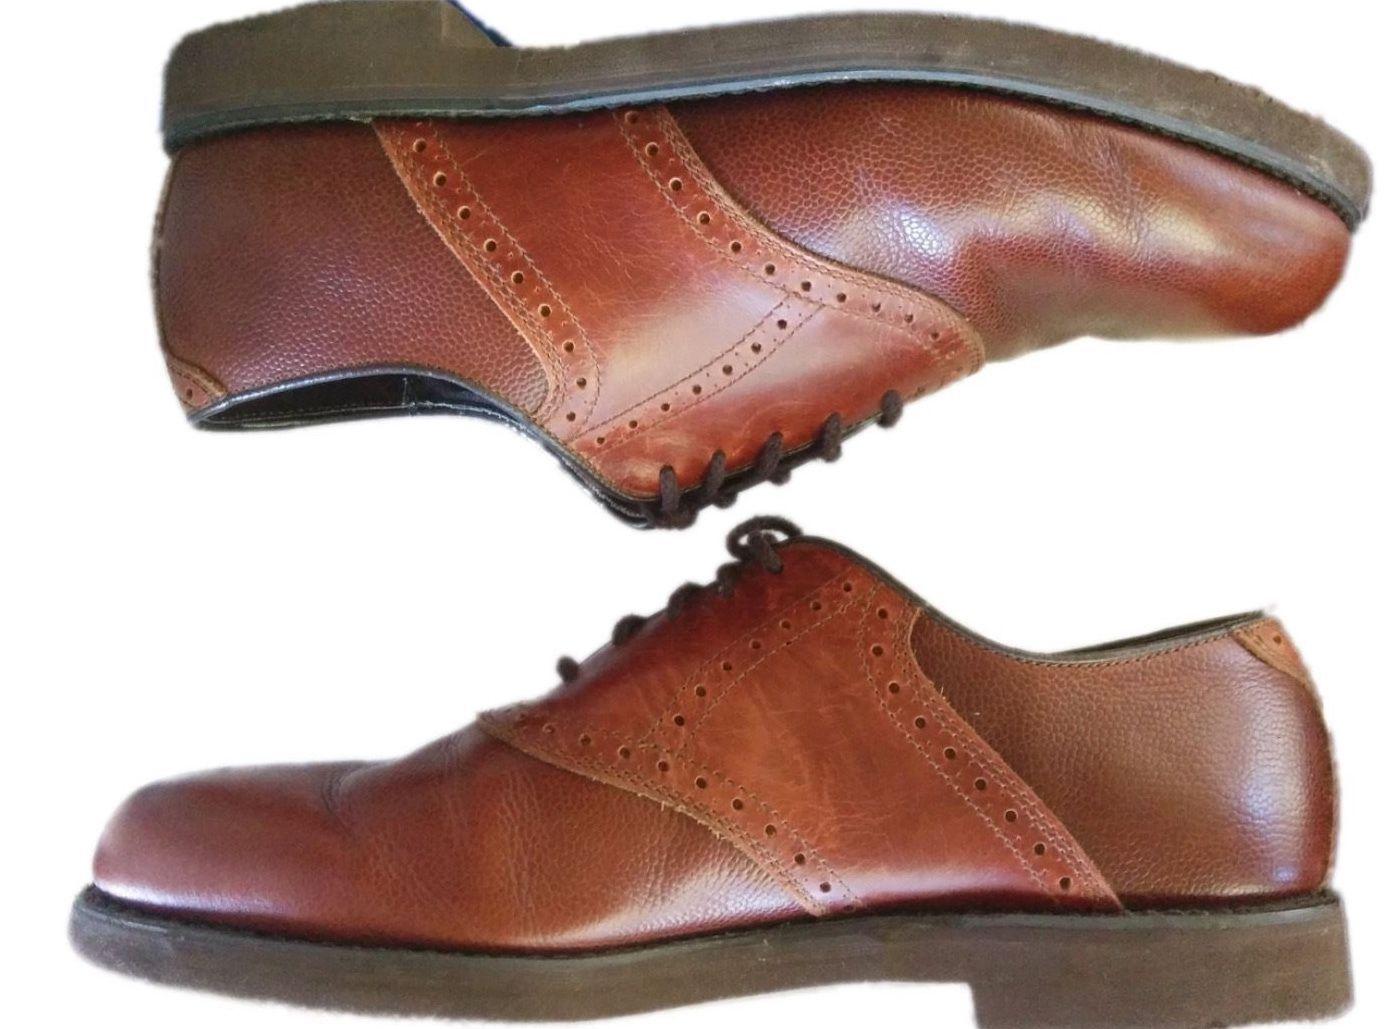 DEXTER USA Brown Saddle Shoes Oxfords Men's Rubber Sole Leather 12 Medium